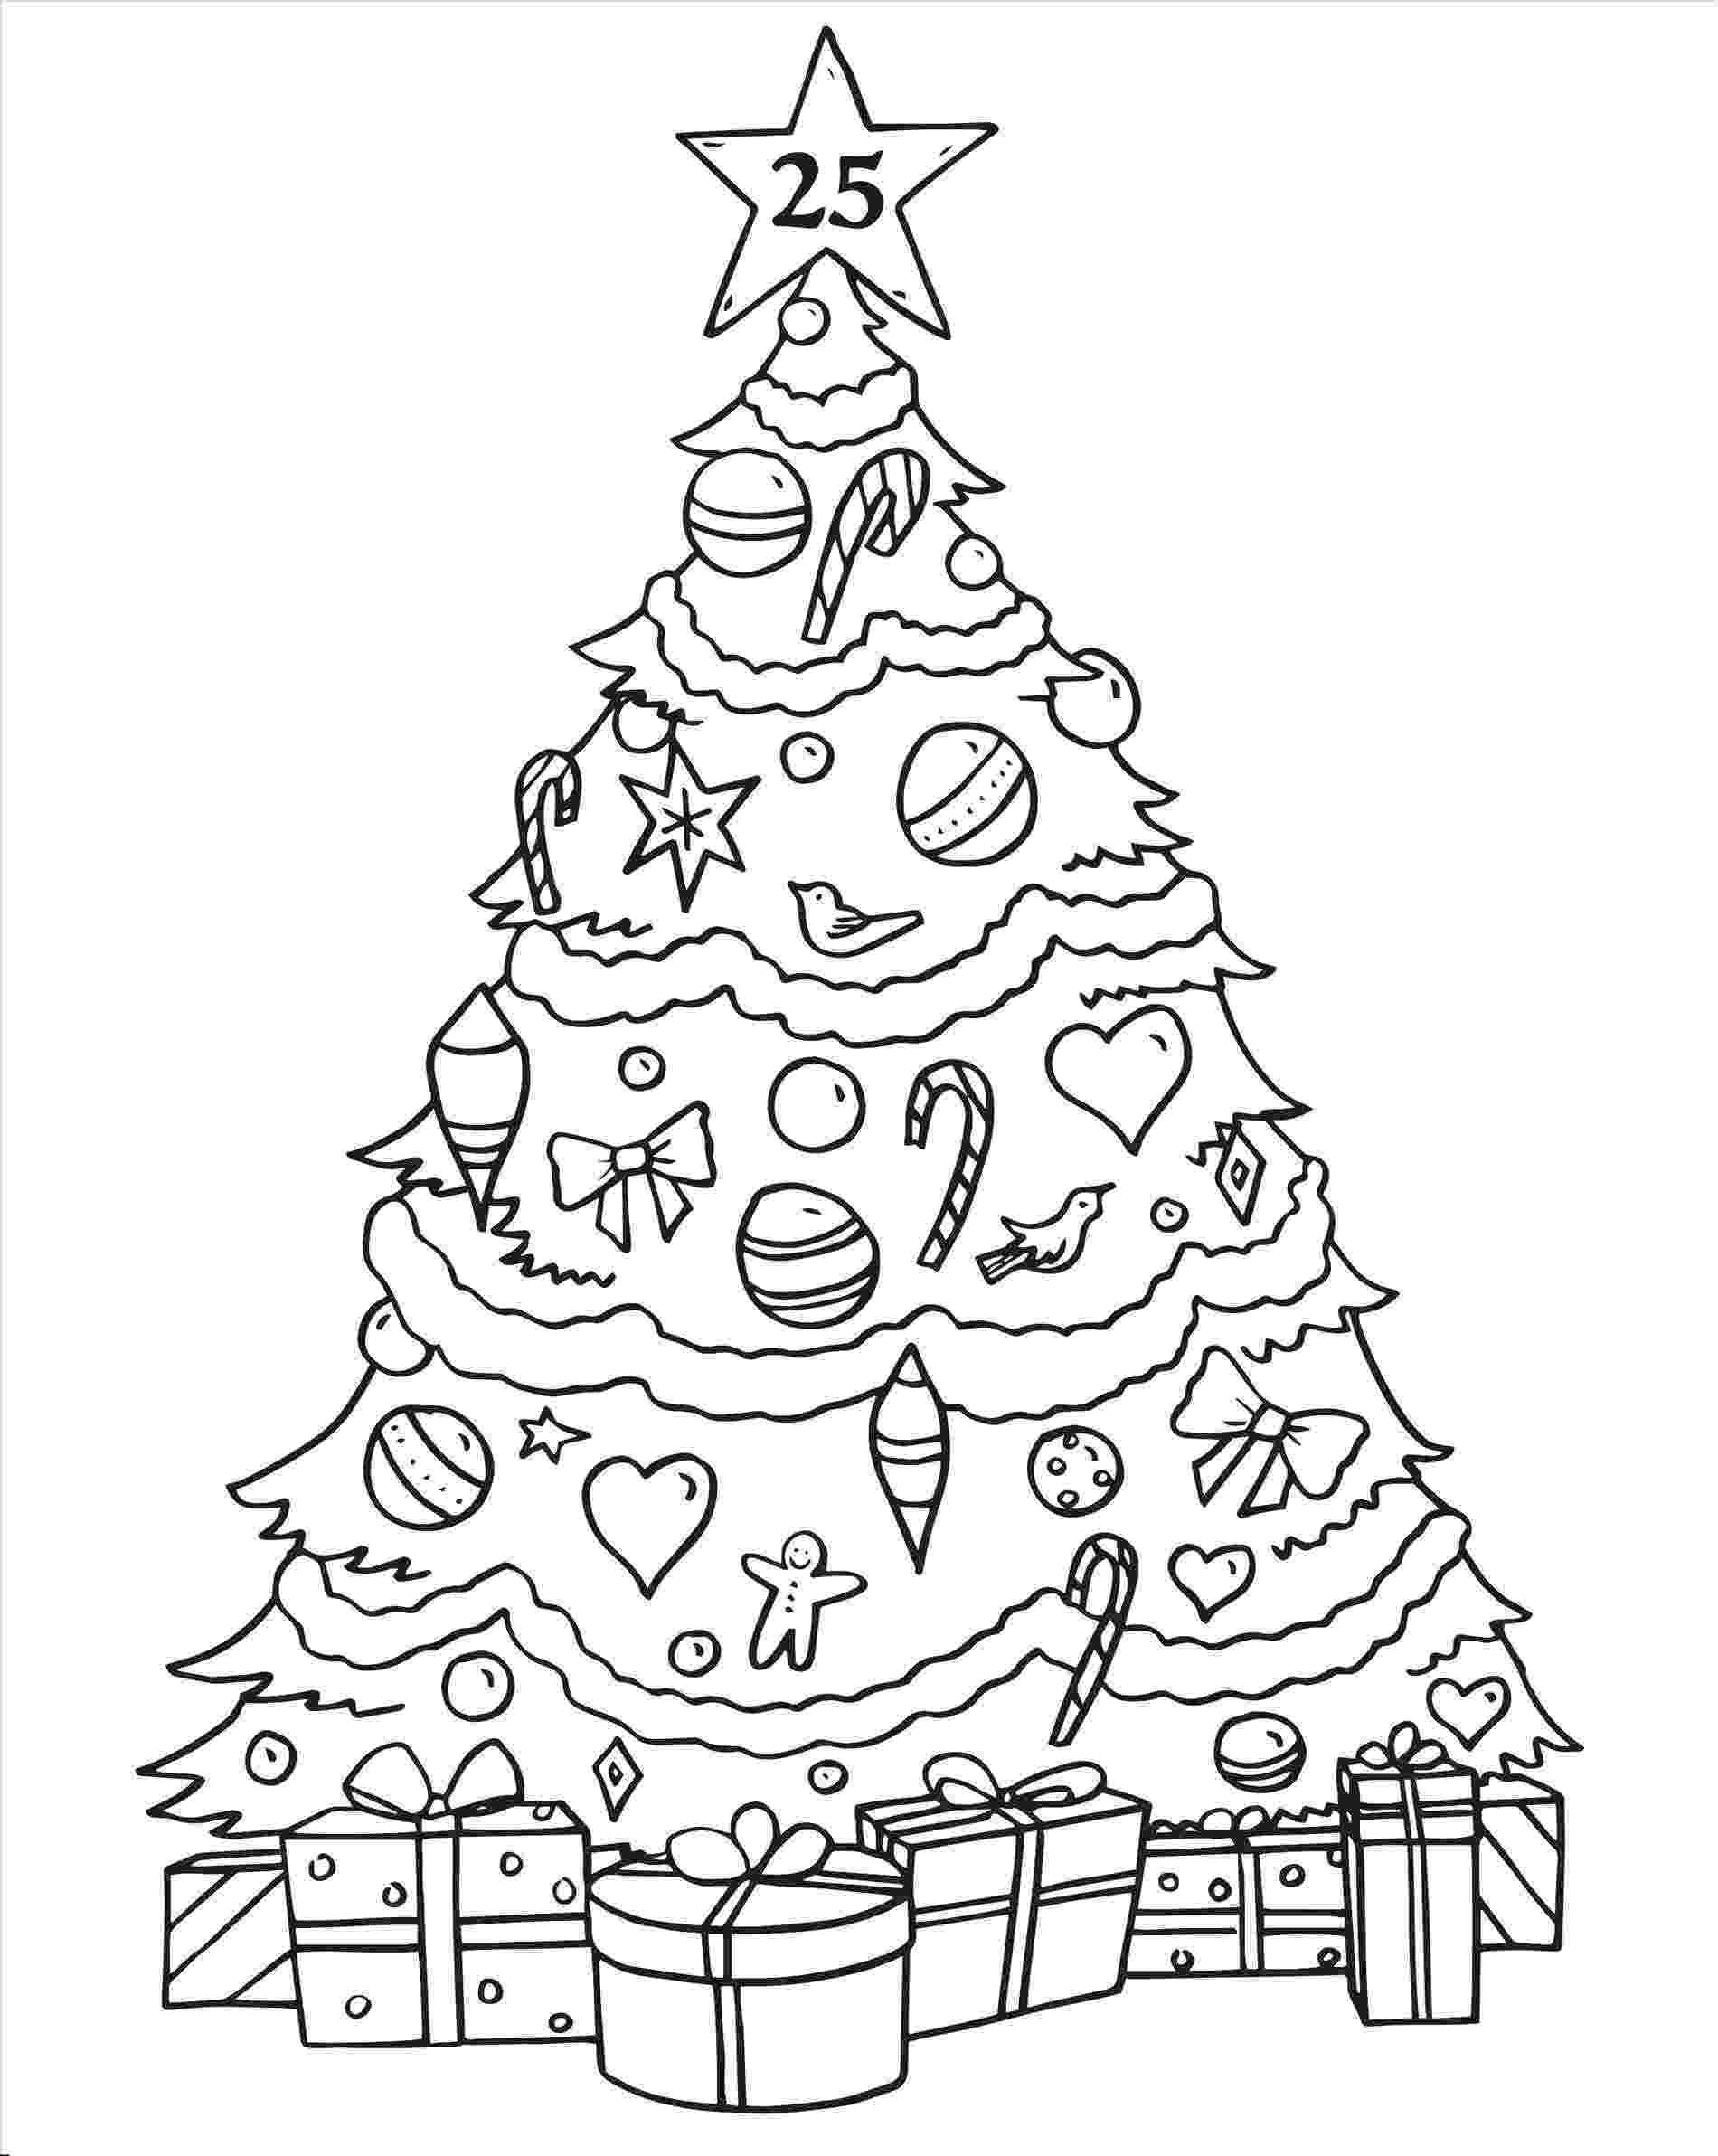 coloring christmas tree christmas tree coloring pages coloring pages to print tree christmas coloring